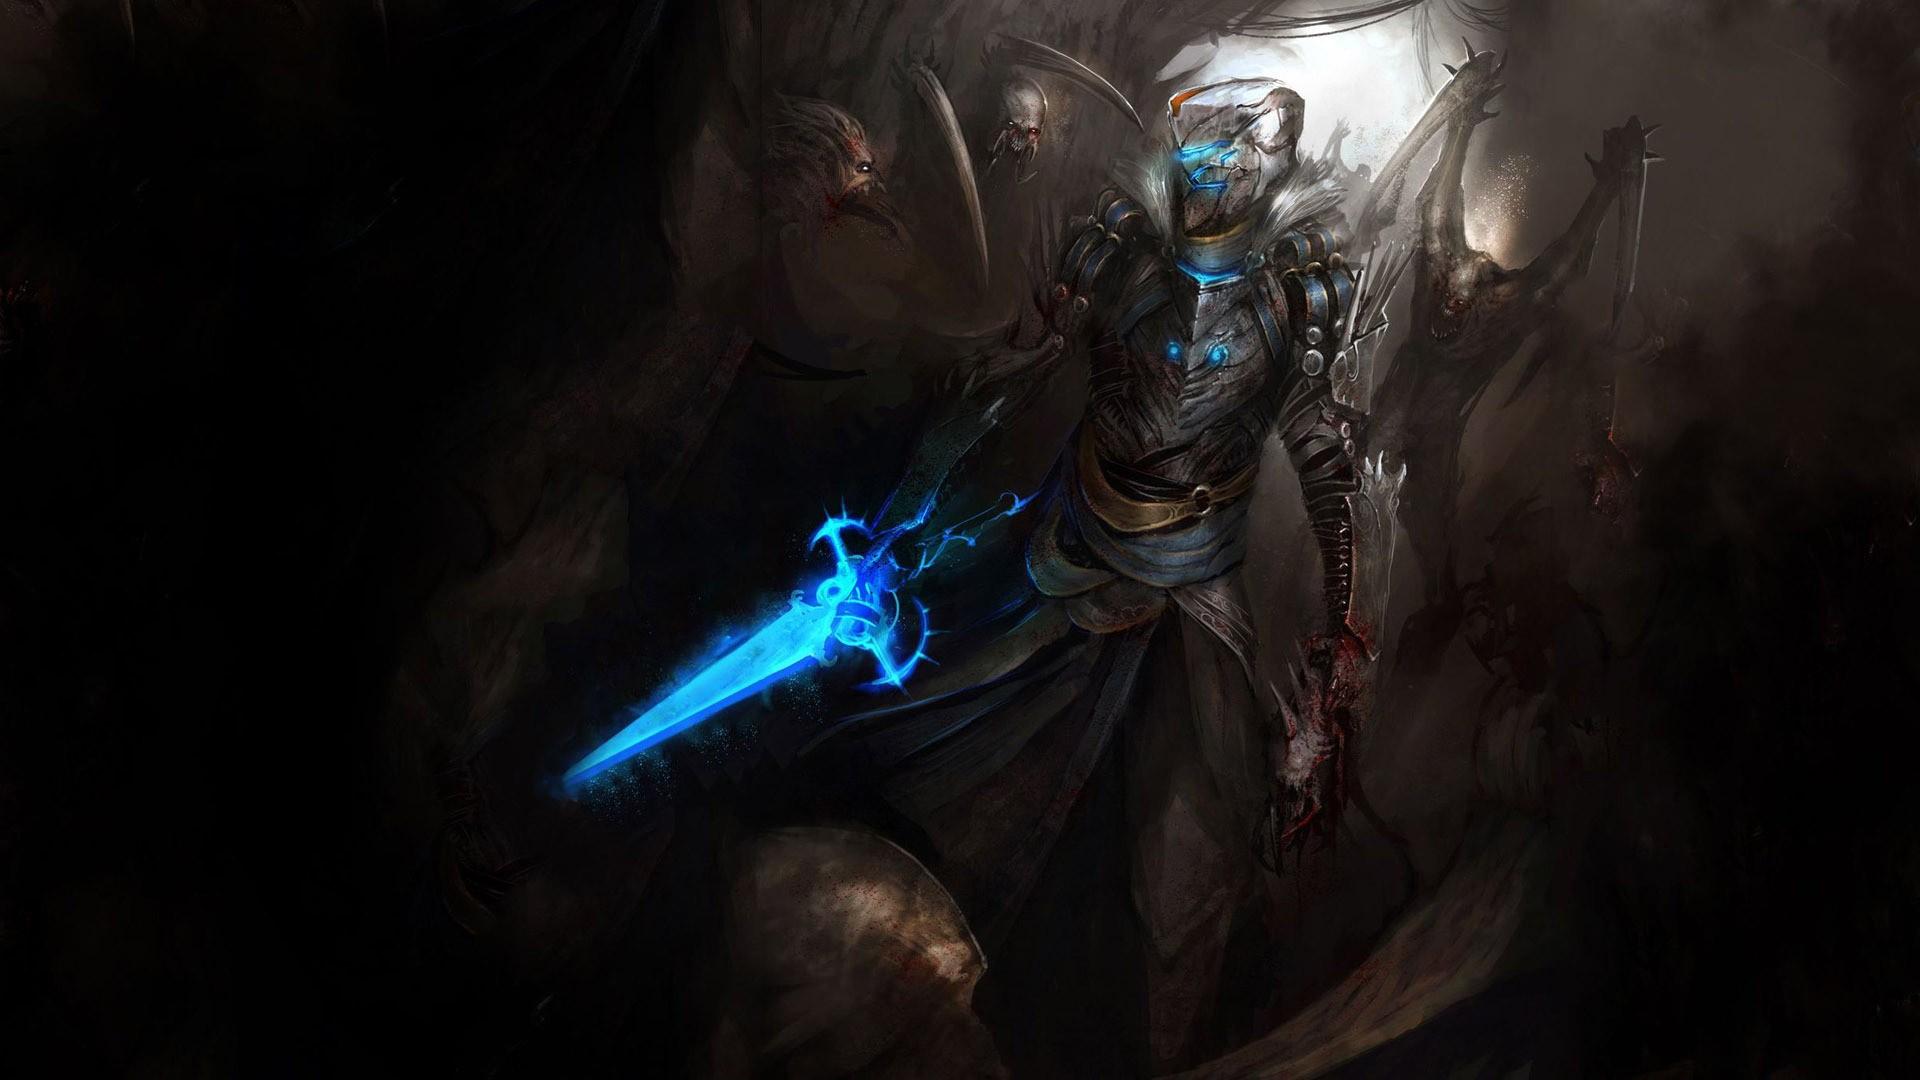 Video Games Knight Artwork Warrior Dead Space Medieval Isaac Clarke Darkness Screenshot Computer Wallpaper